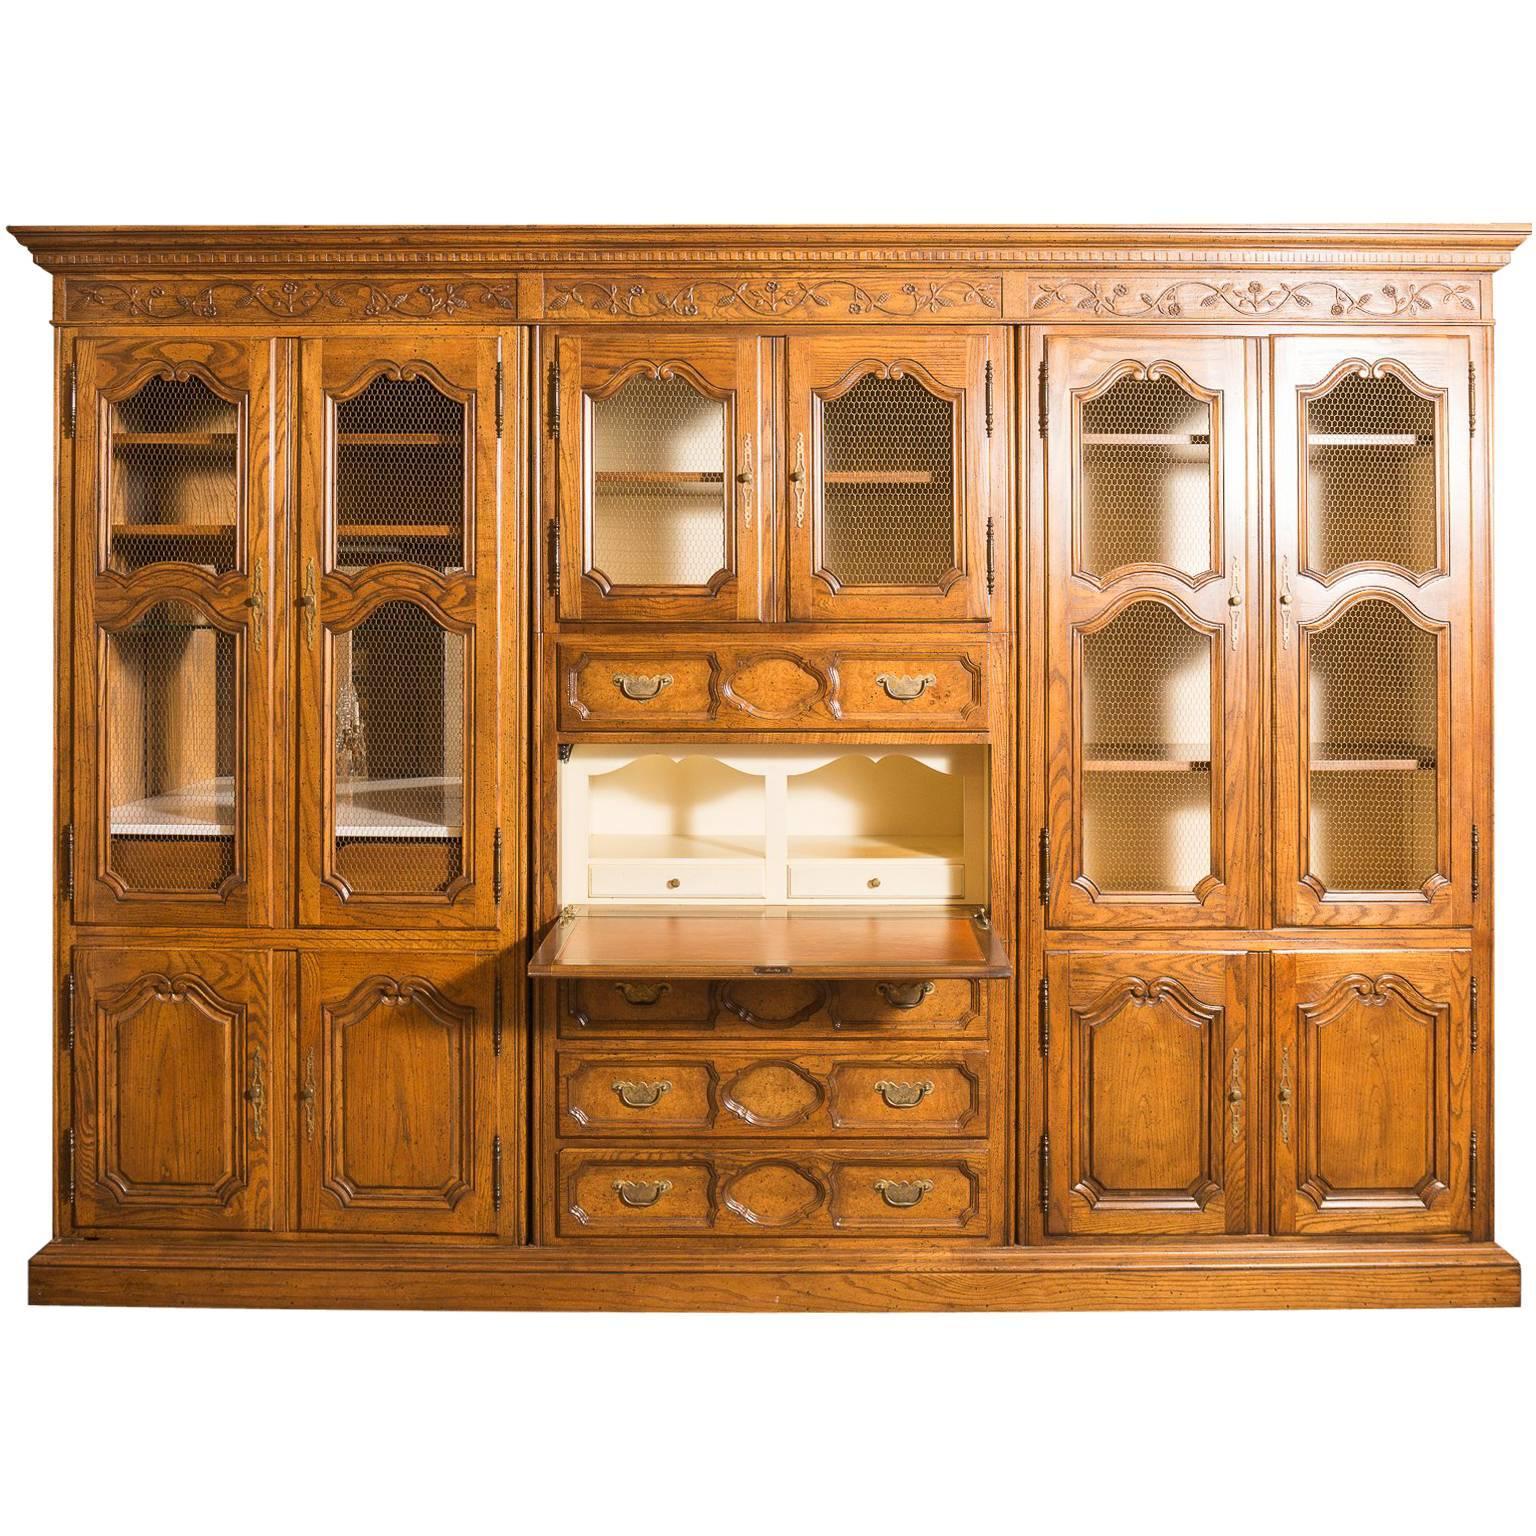 Country French Walnut Baker Secretary With Drop Desk Mini Bar And Lattice  Doors